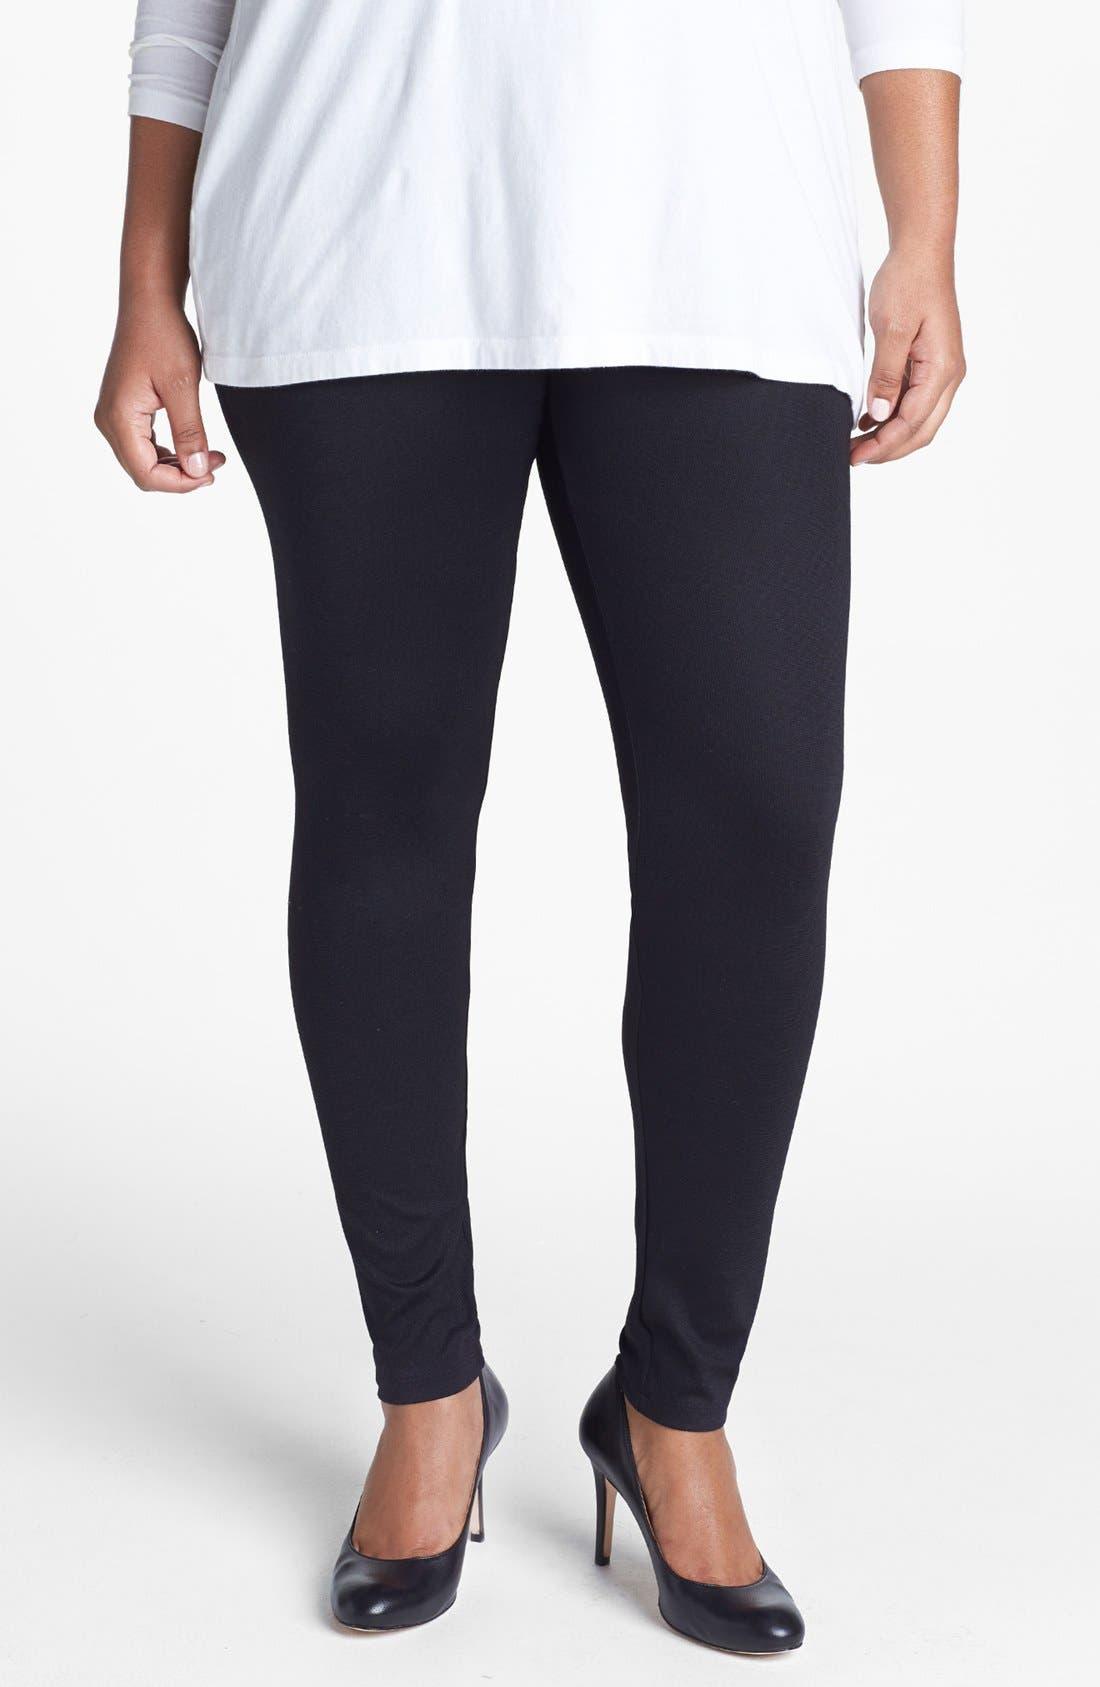 Alternate Image 1 Selected - Sejour Ponte Knit Leggings (Plus Size)